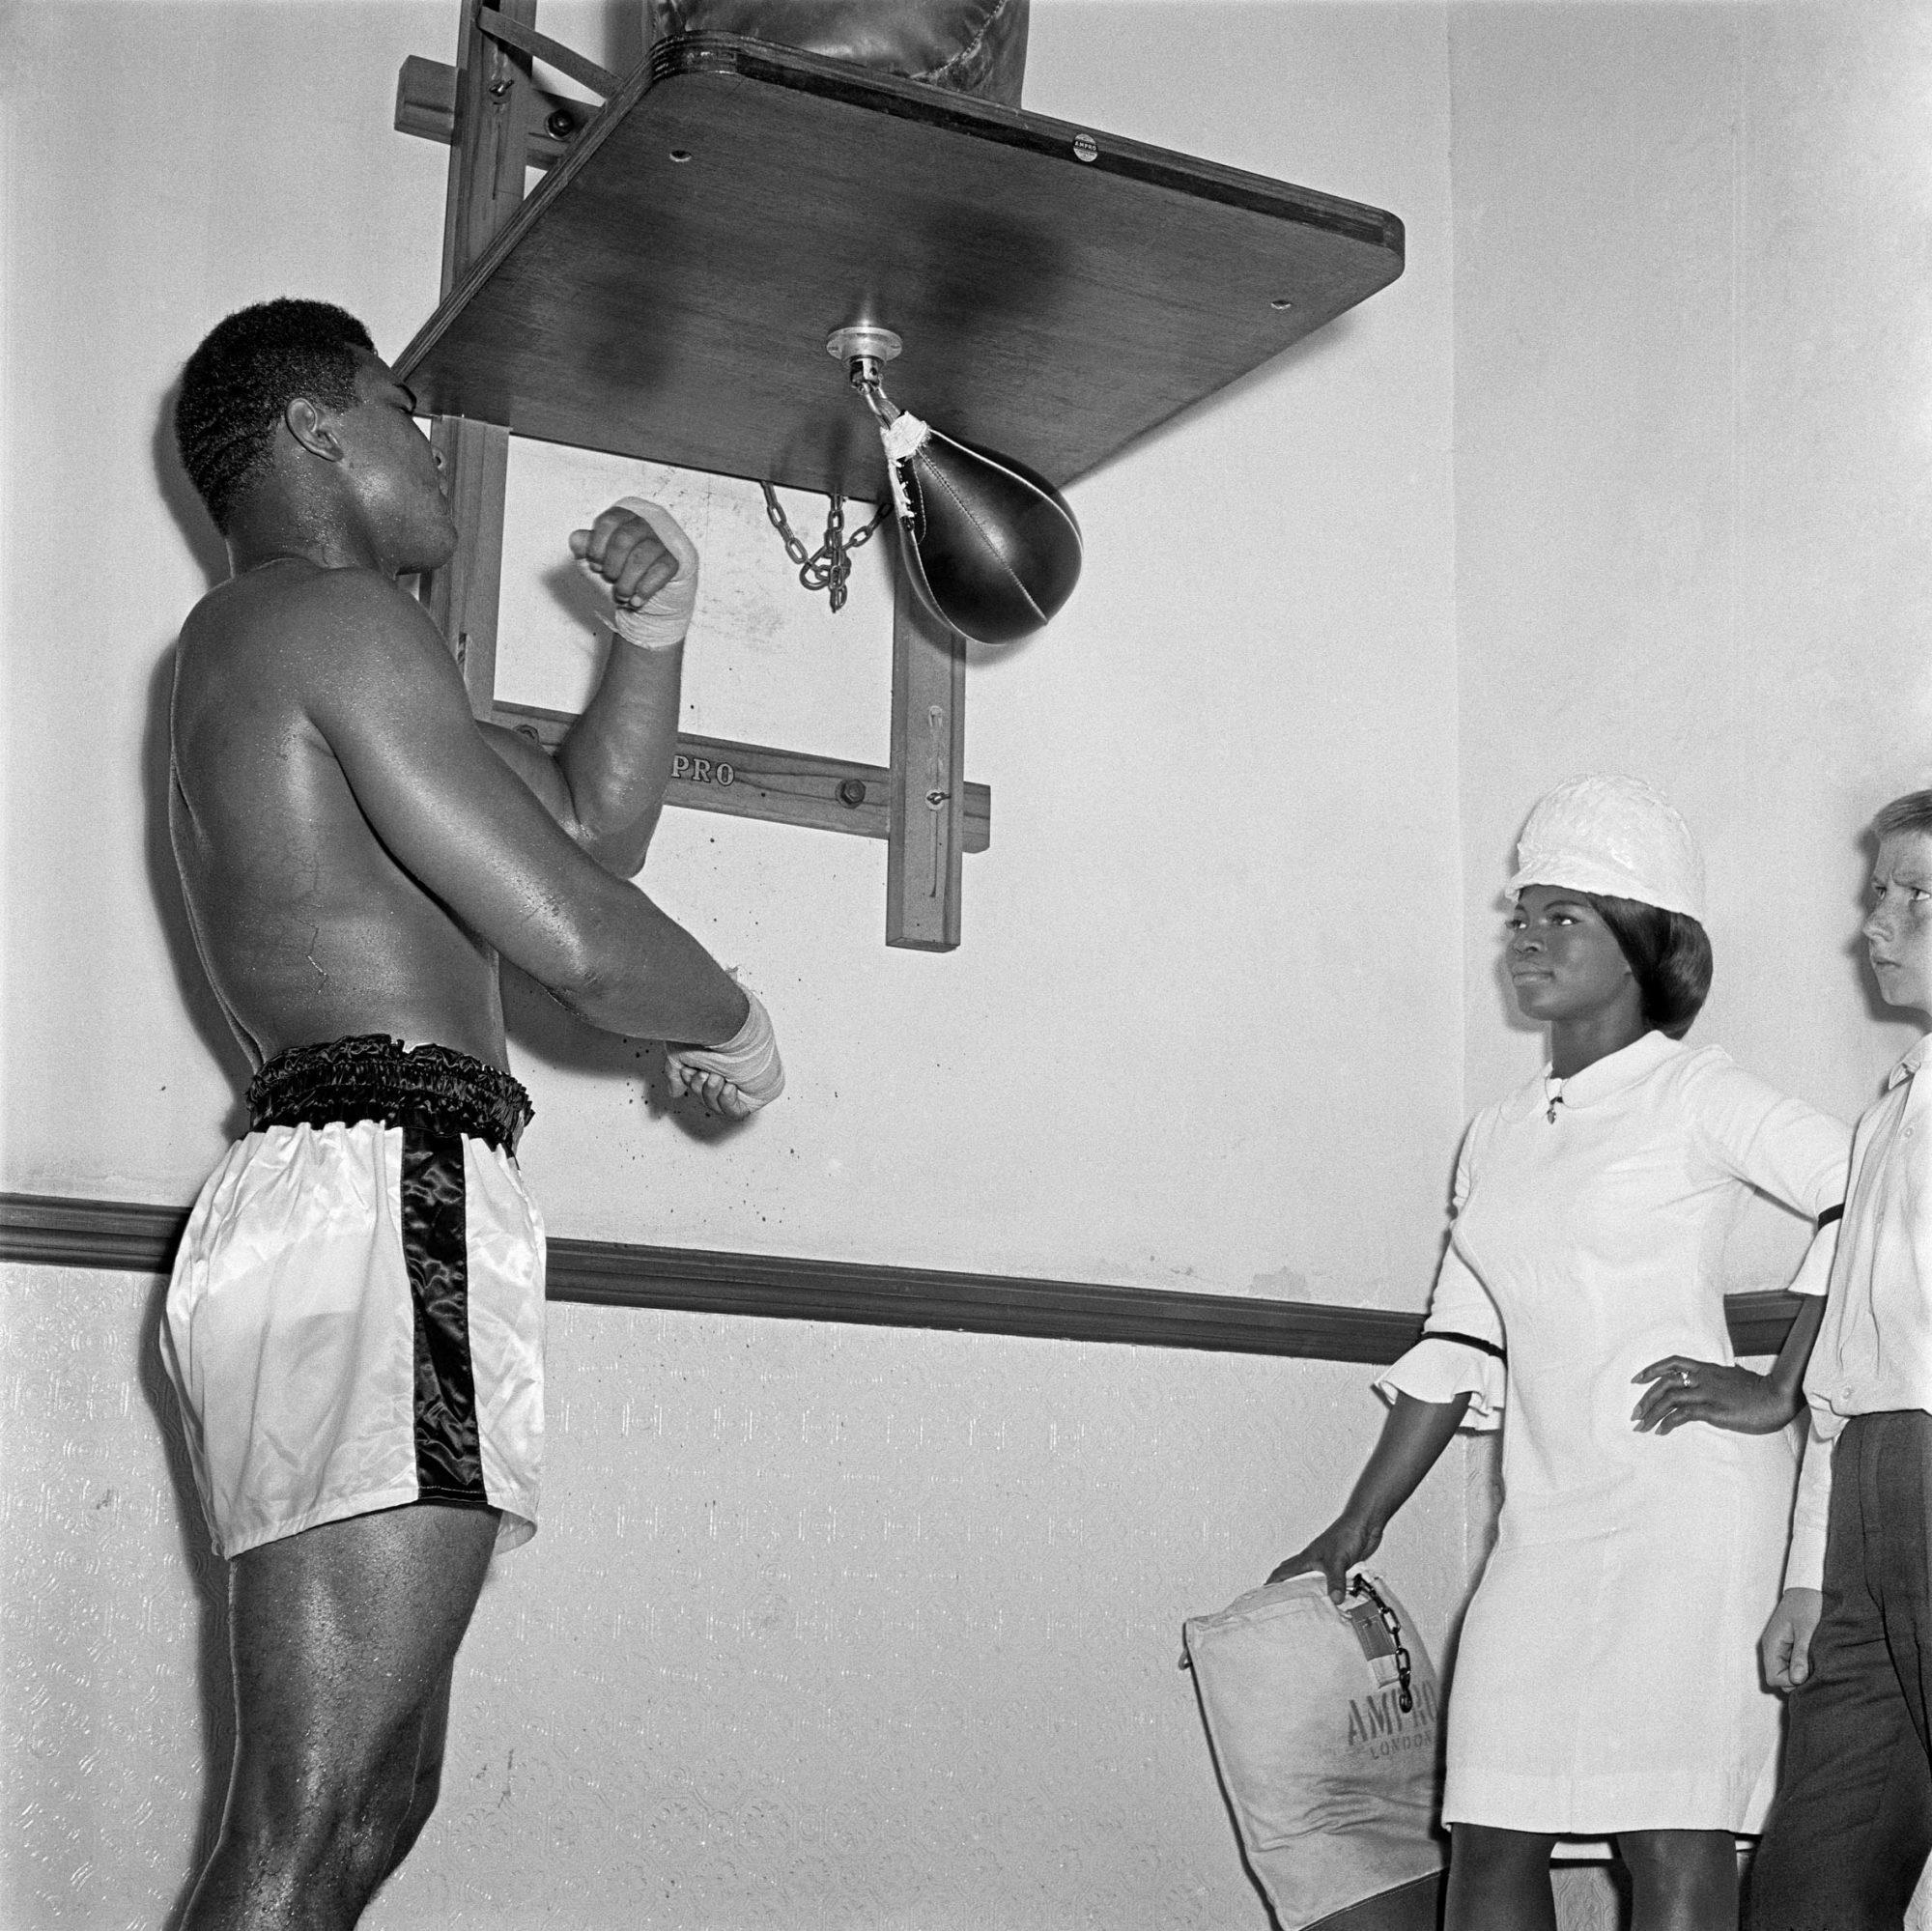 Muhammad Ali training at Earl's Court, London 1966 © James Barnor/Autograph ABP